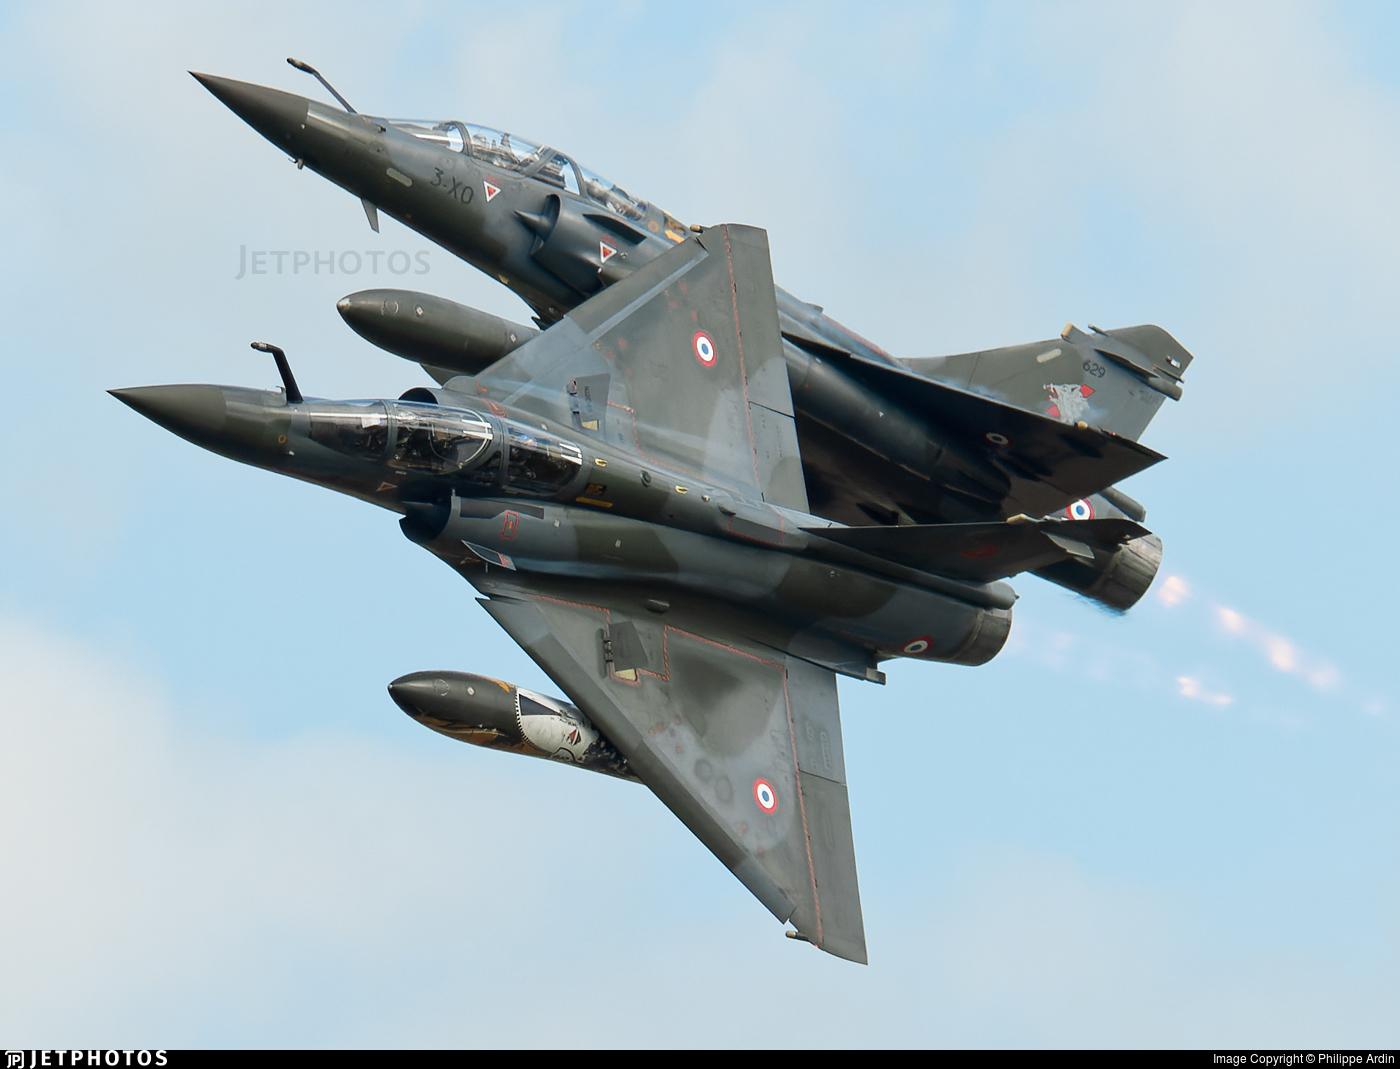 675 - Dassault Mirage 2000D - France - Air Force